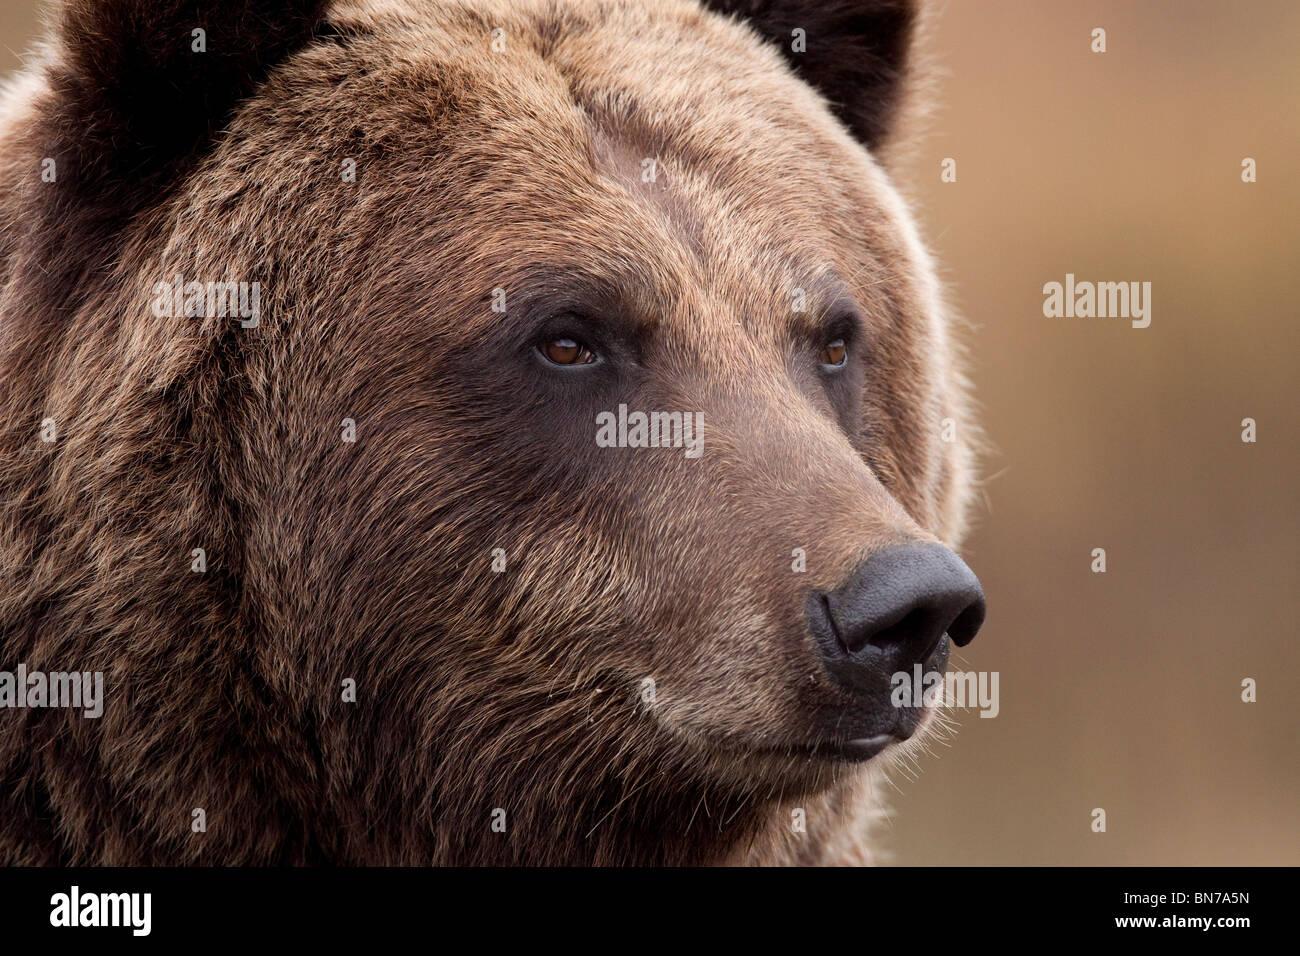 CAPTIVE: Portrait of an adult Grizzly bear, Alaska Wildlife Conservation Center, Alaska - Stock Image